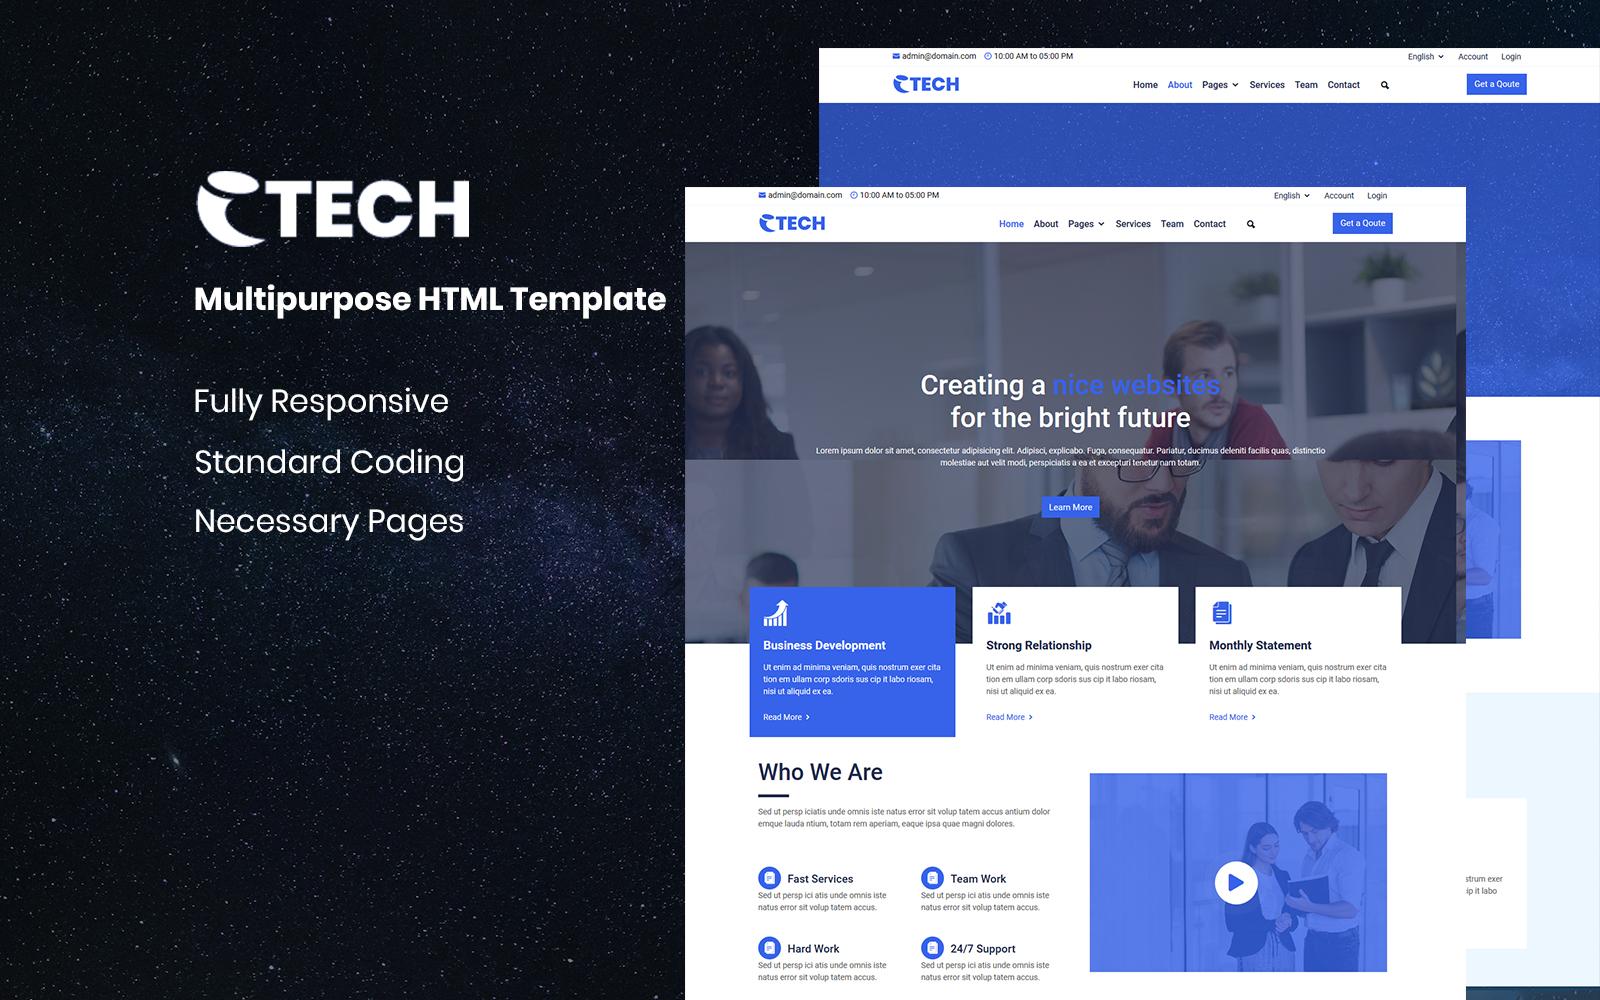 eTech - Multipurpose HTML Website Template